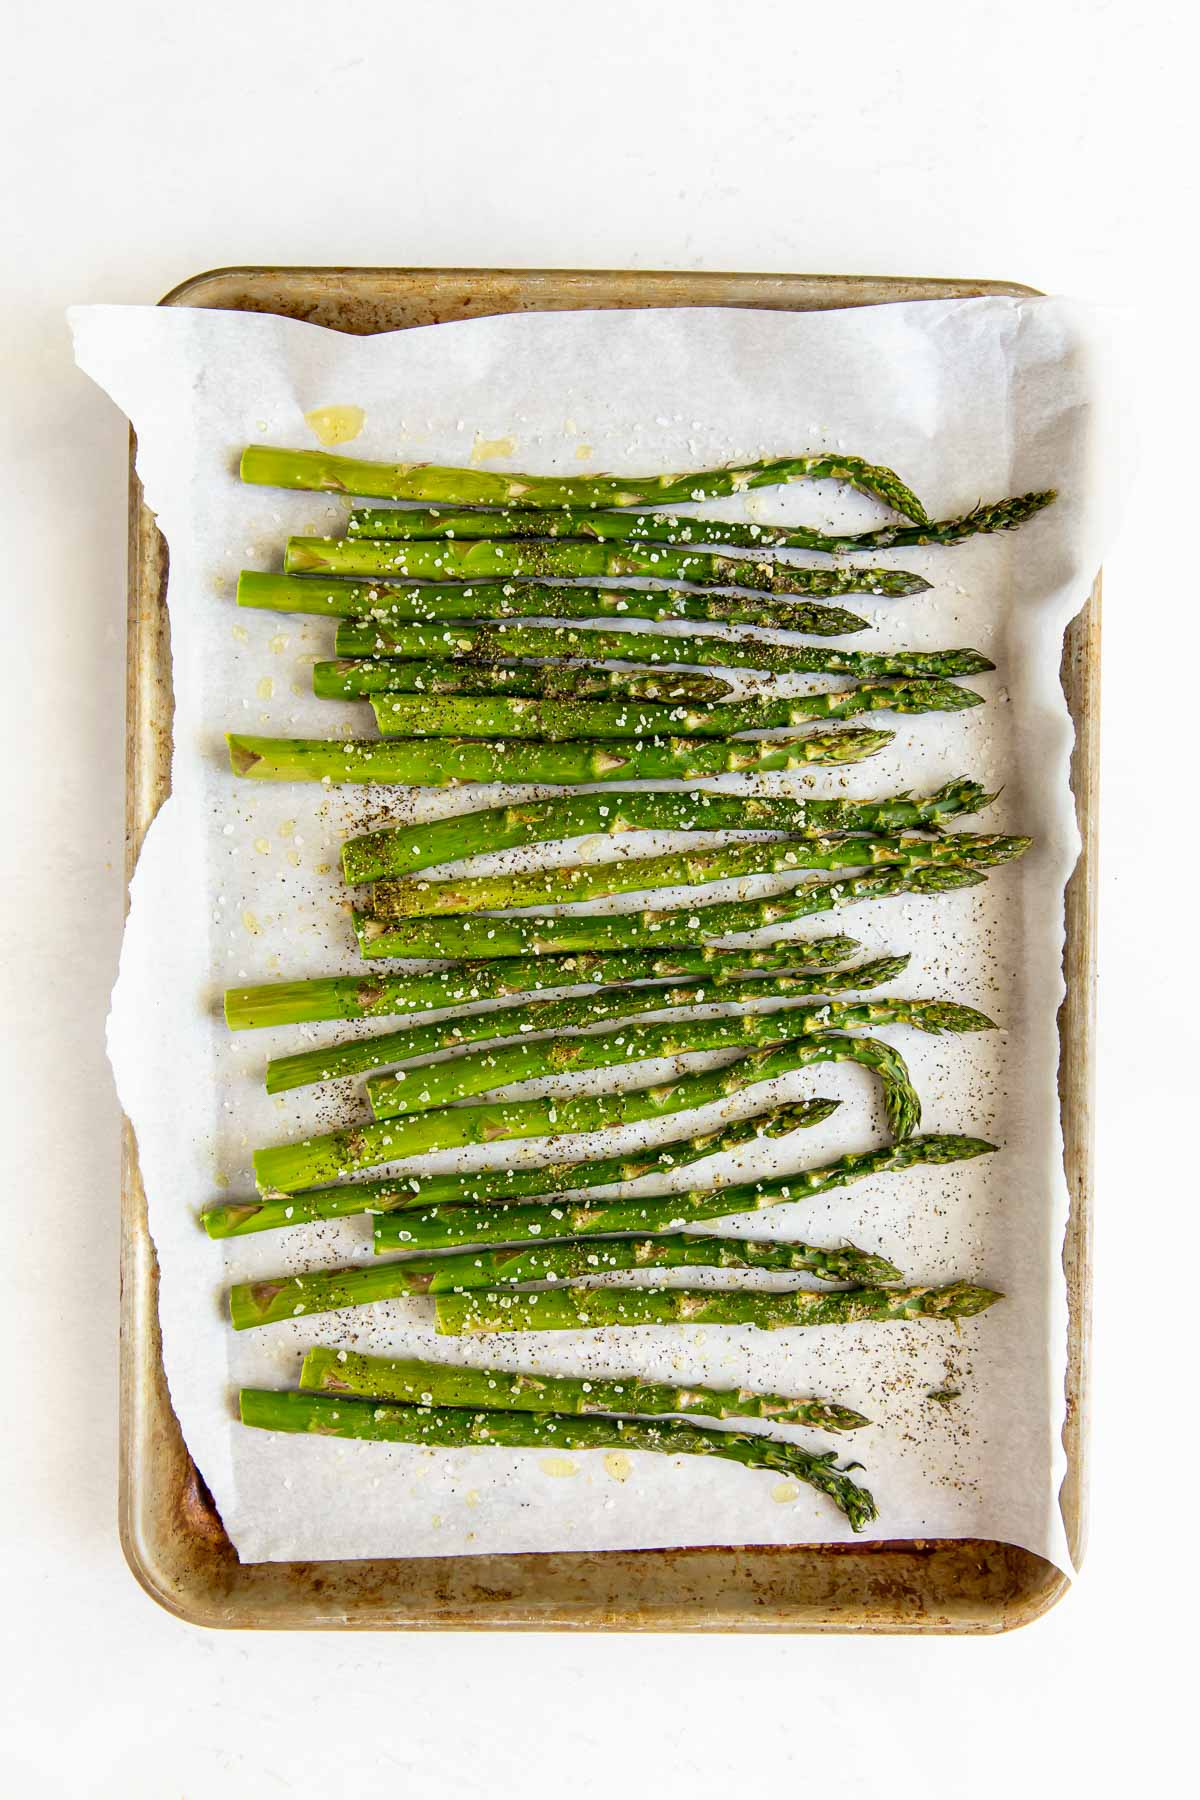 baked asparagus on baking sheet